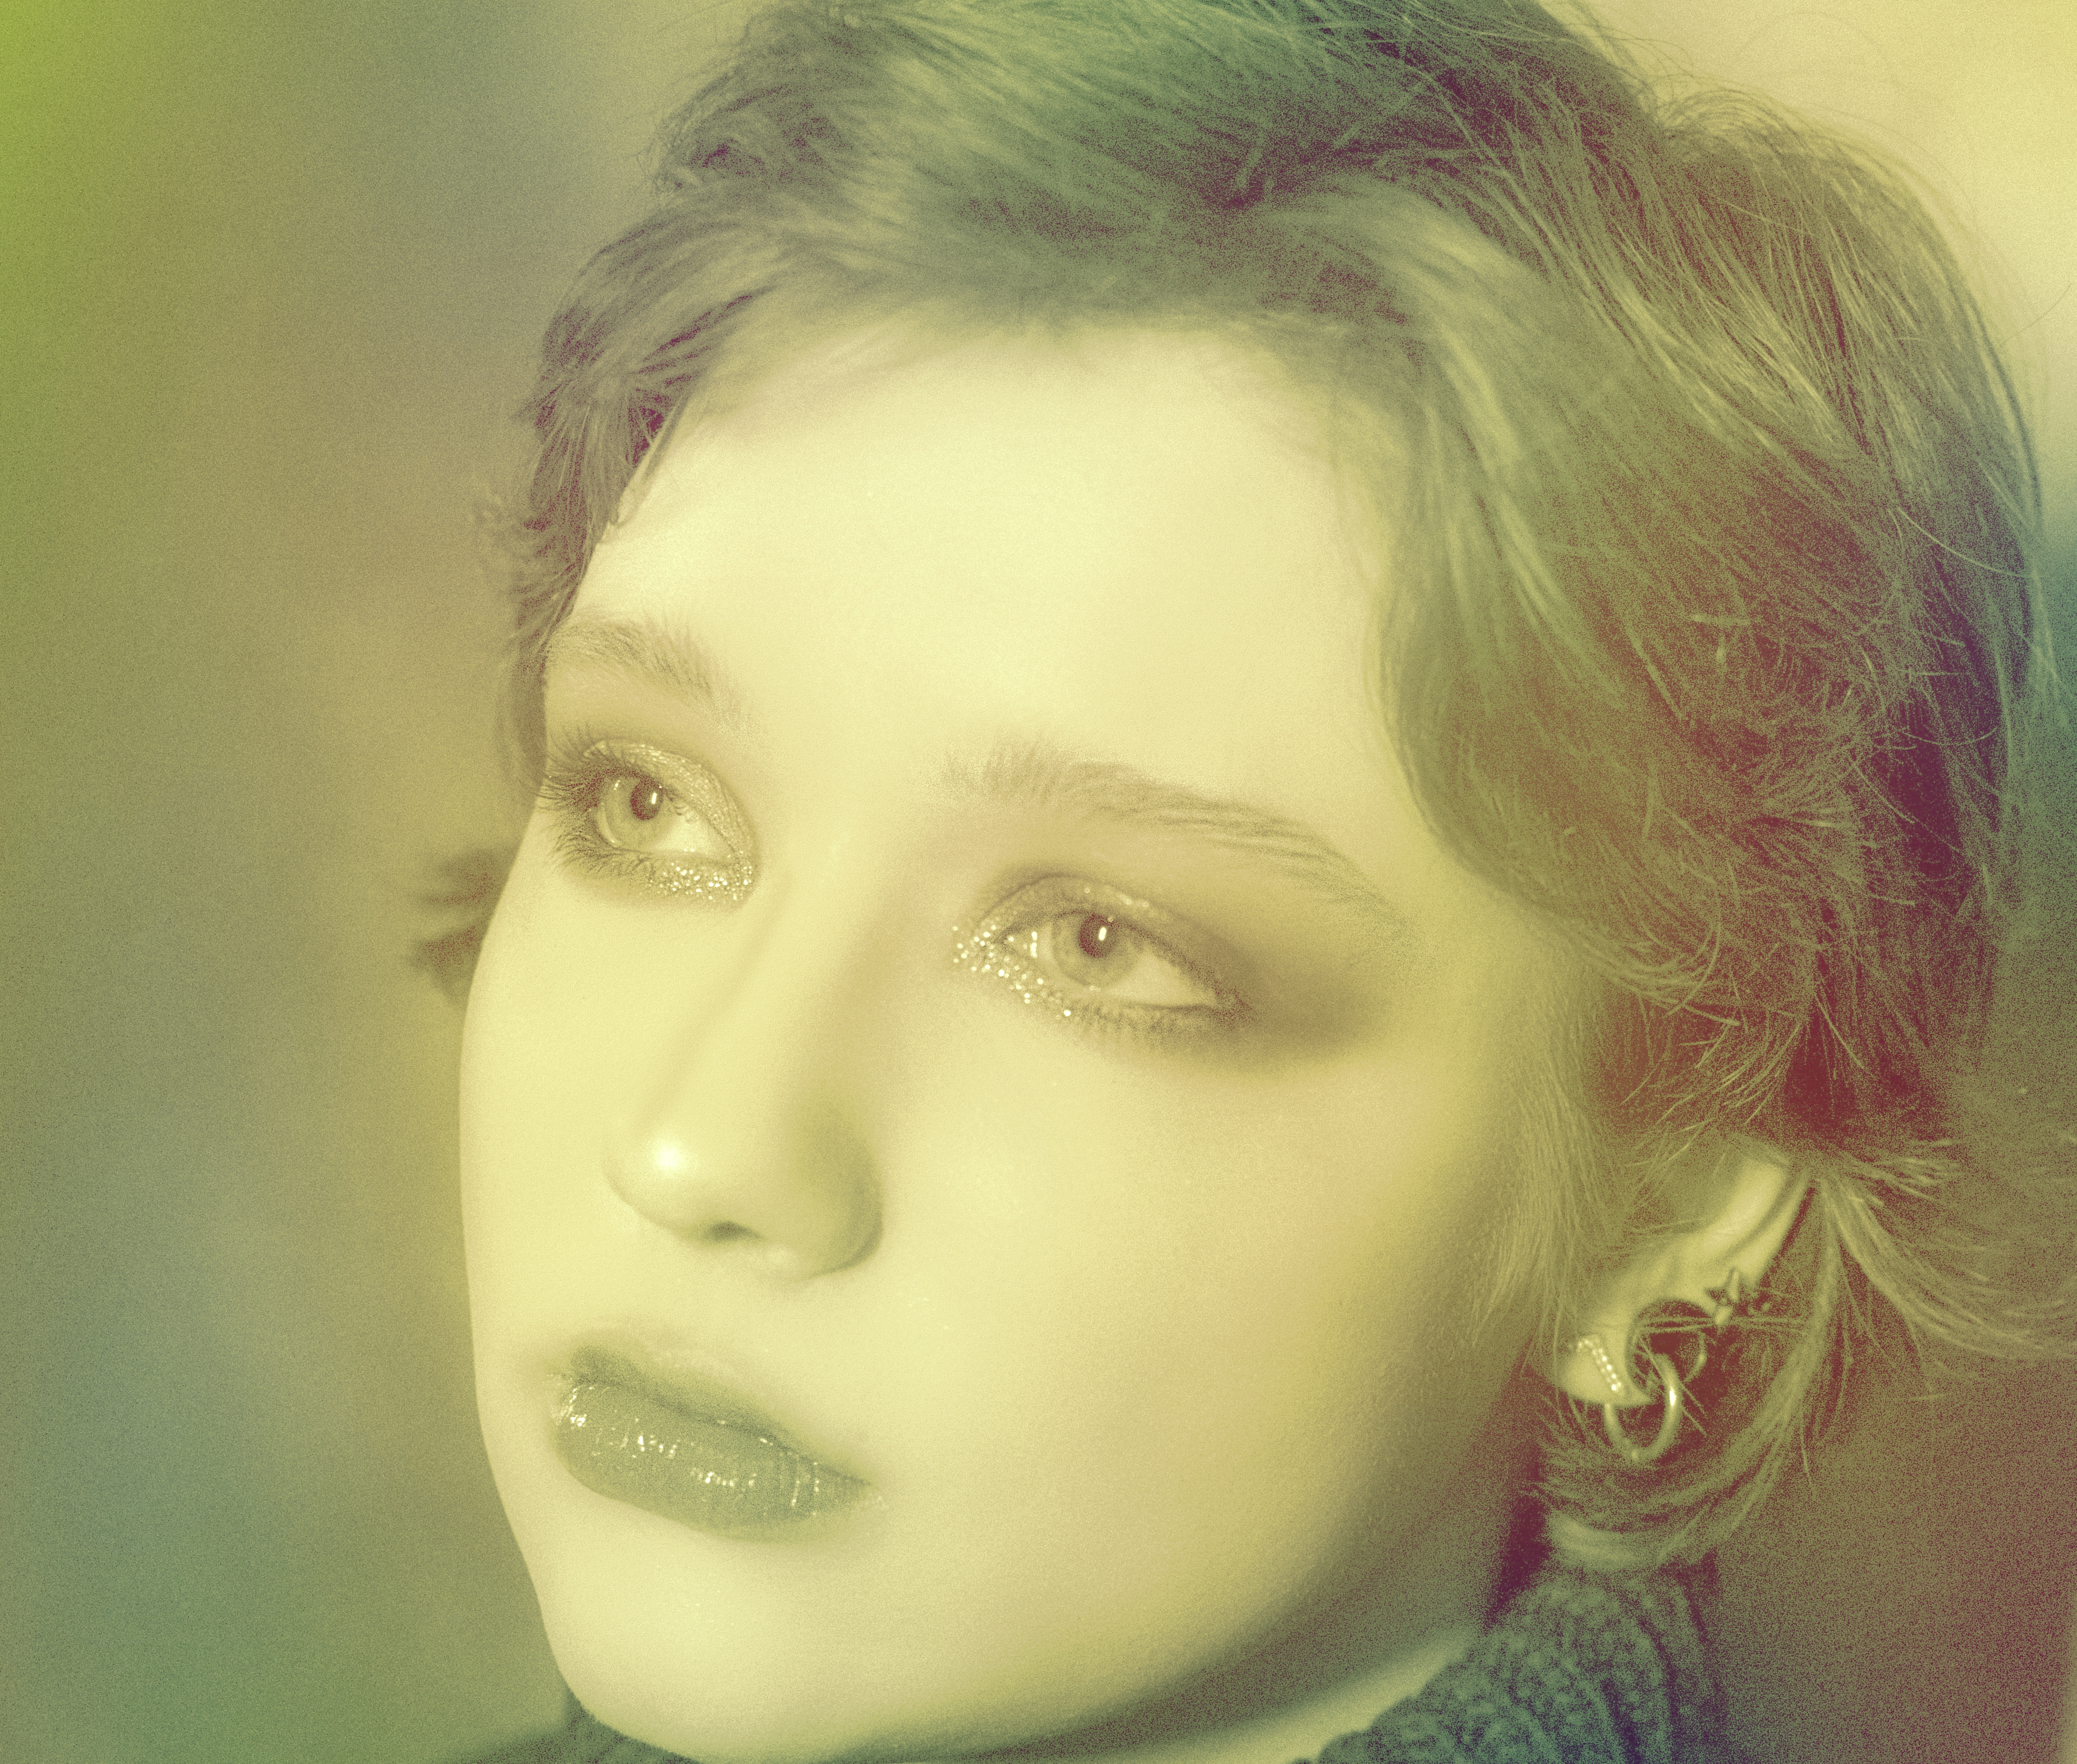 DSCF1267_retro_girl